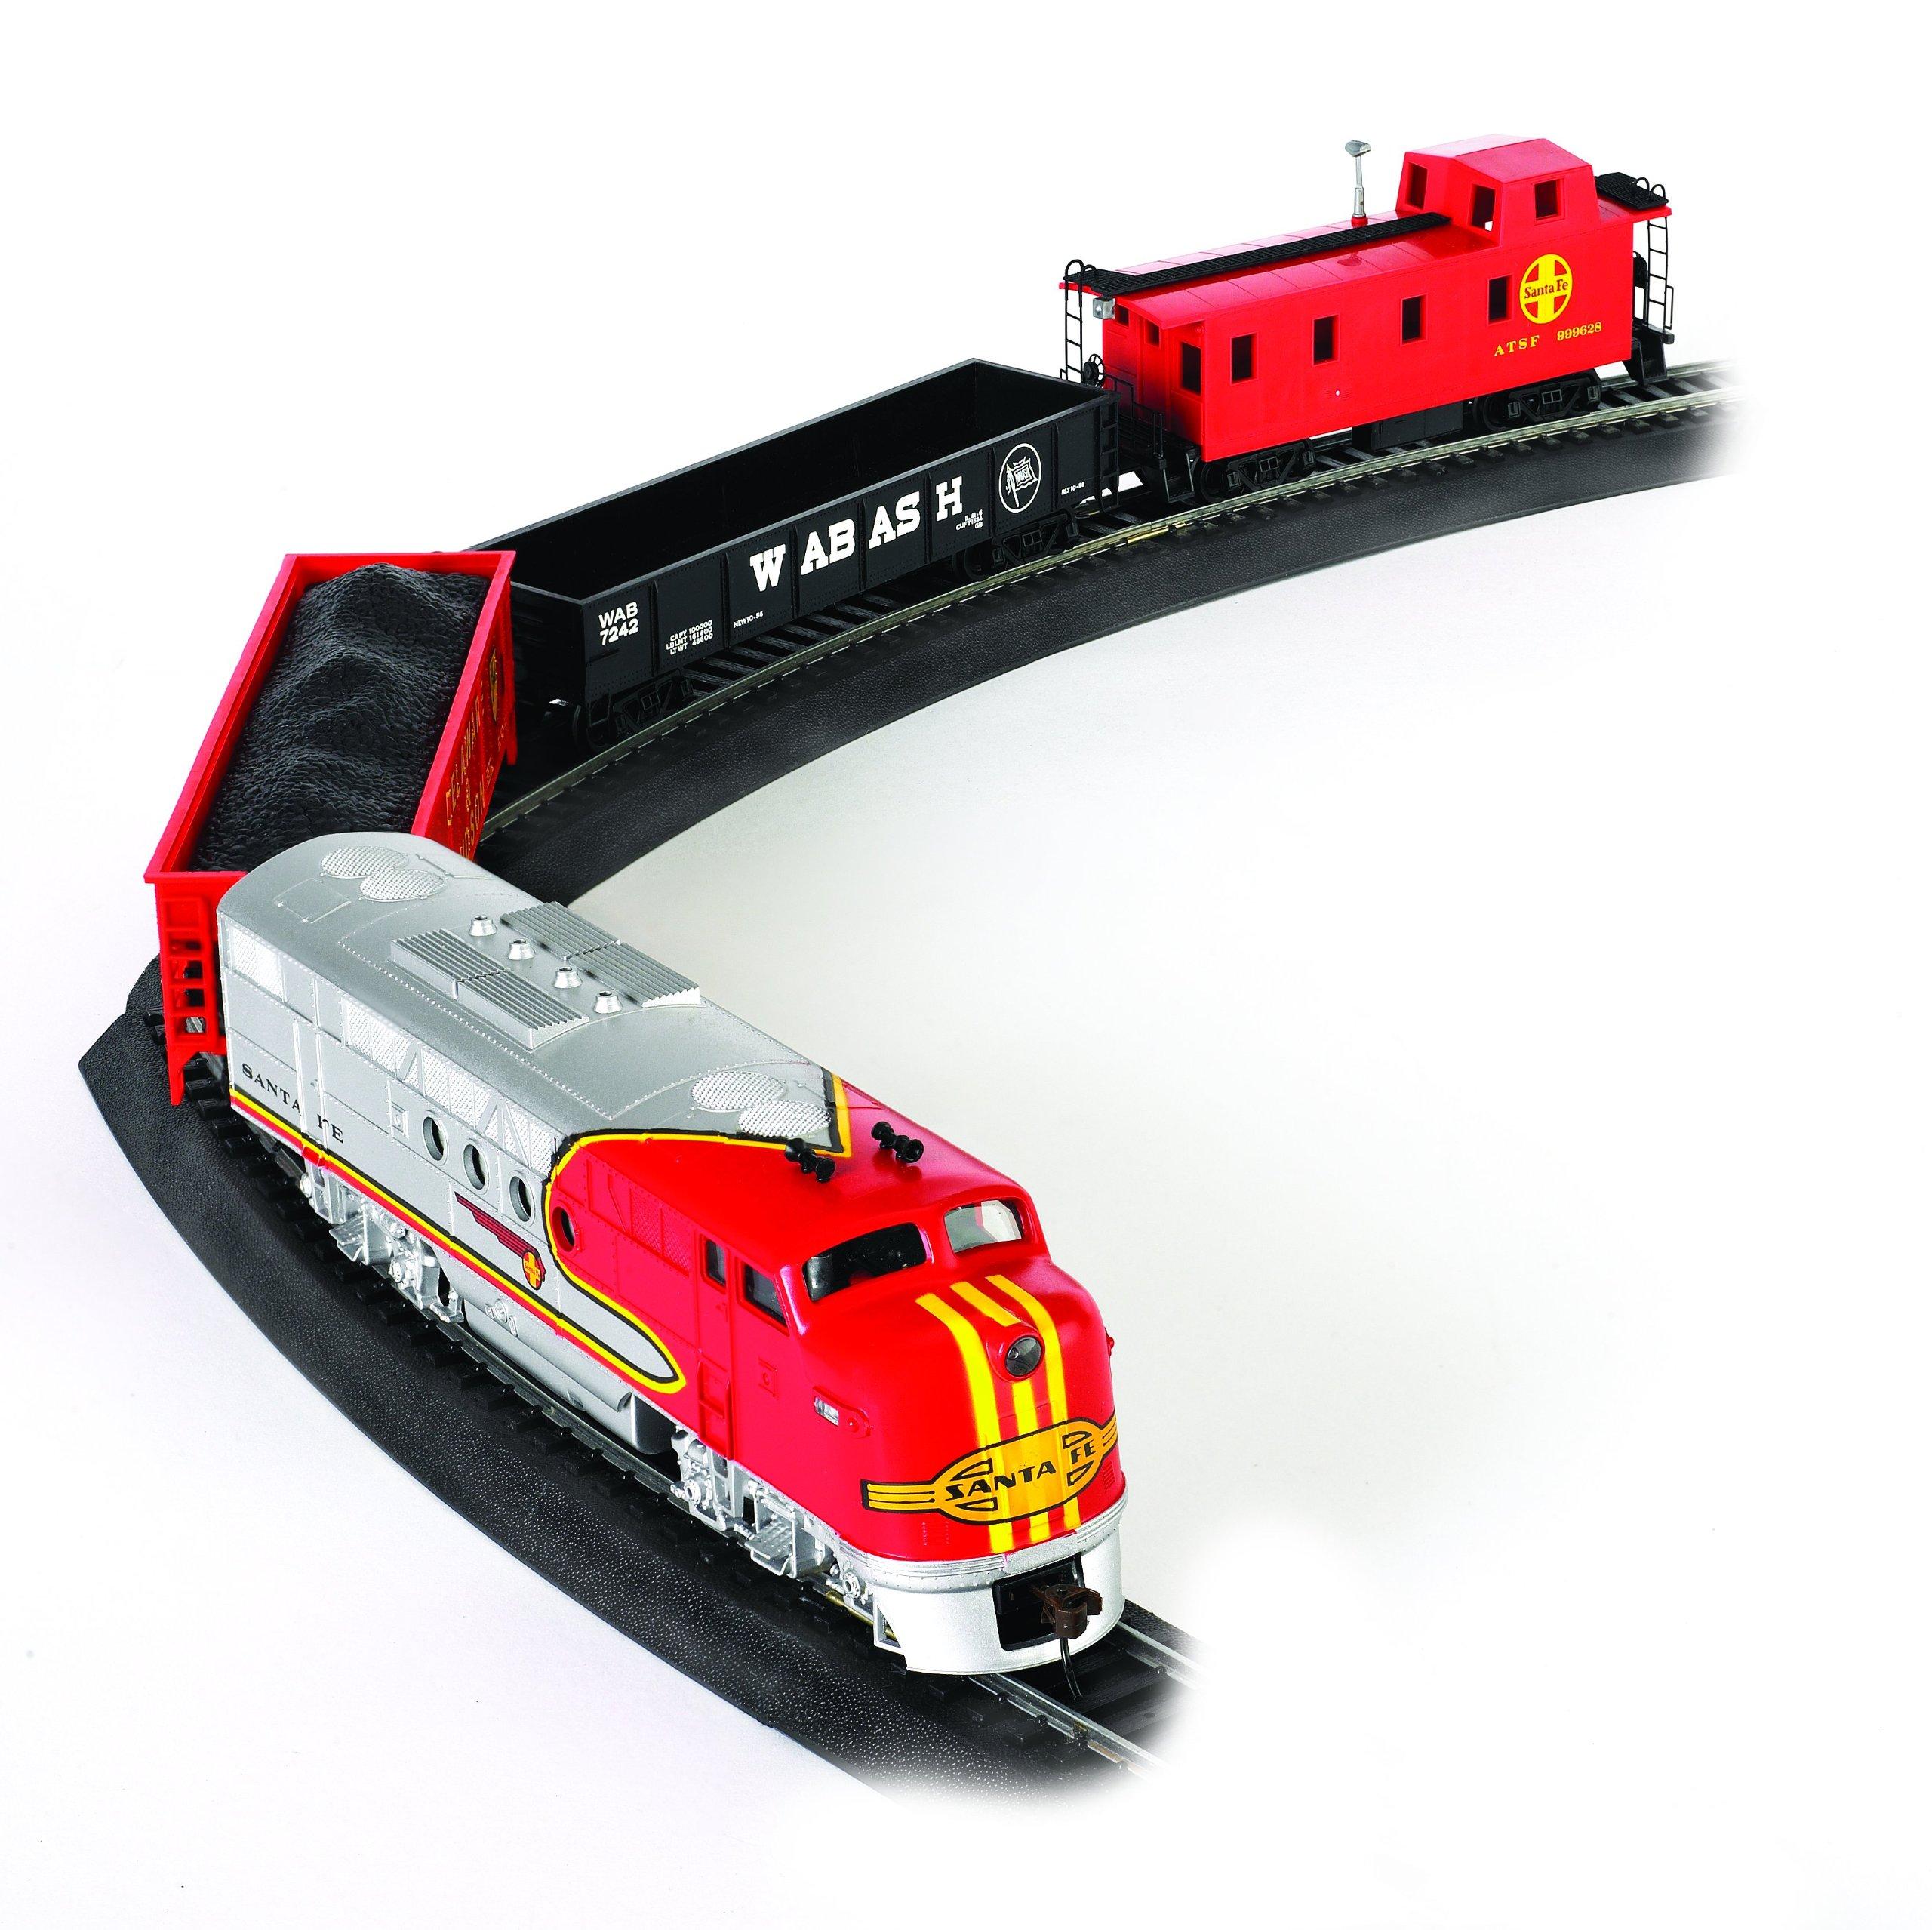 Bachmann Trains - Santa Fe Flyer Ready To Run Electric Train Set - HO Scale by Bachmann Trains